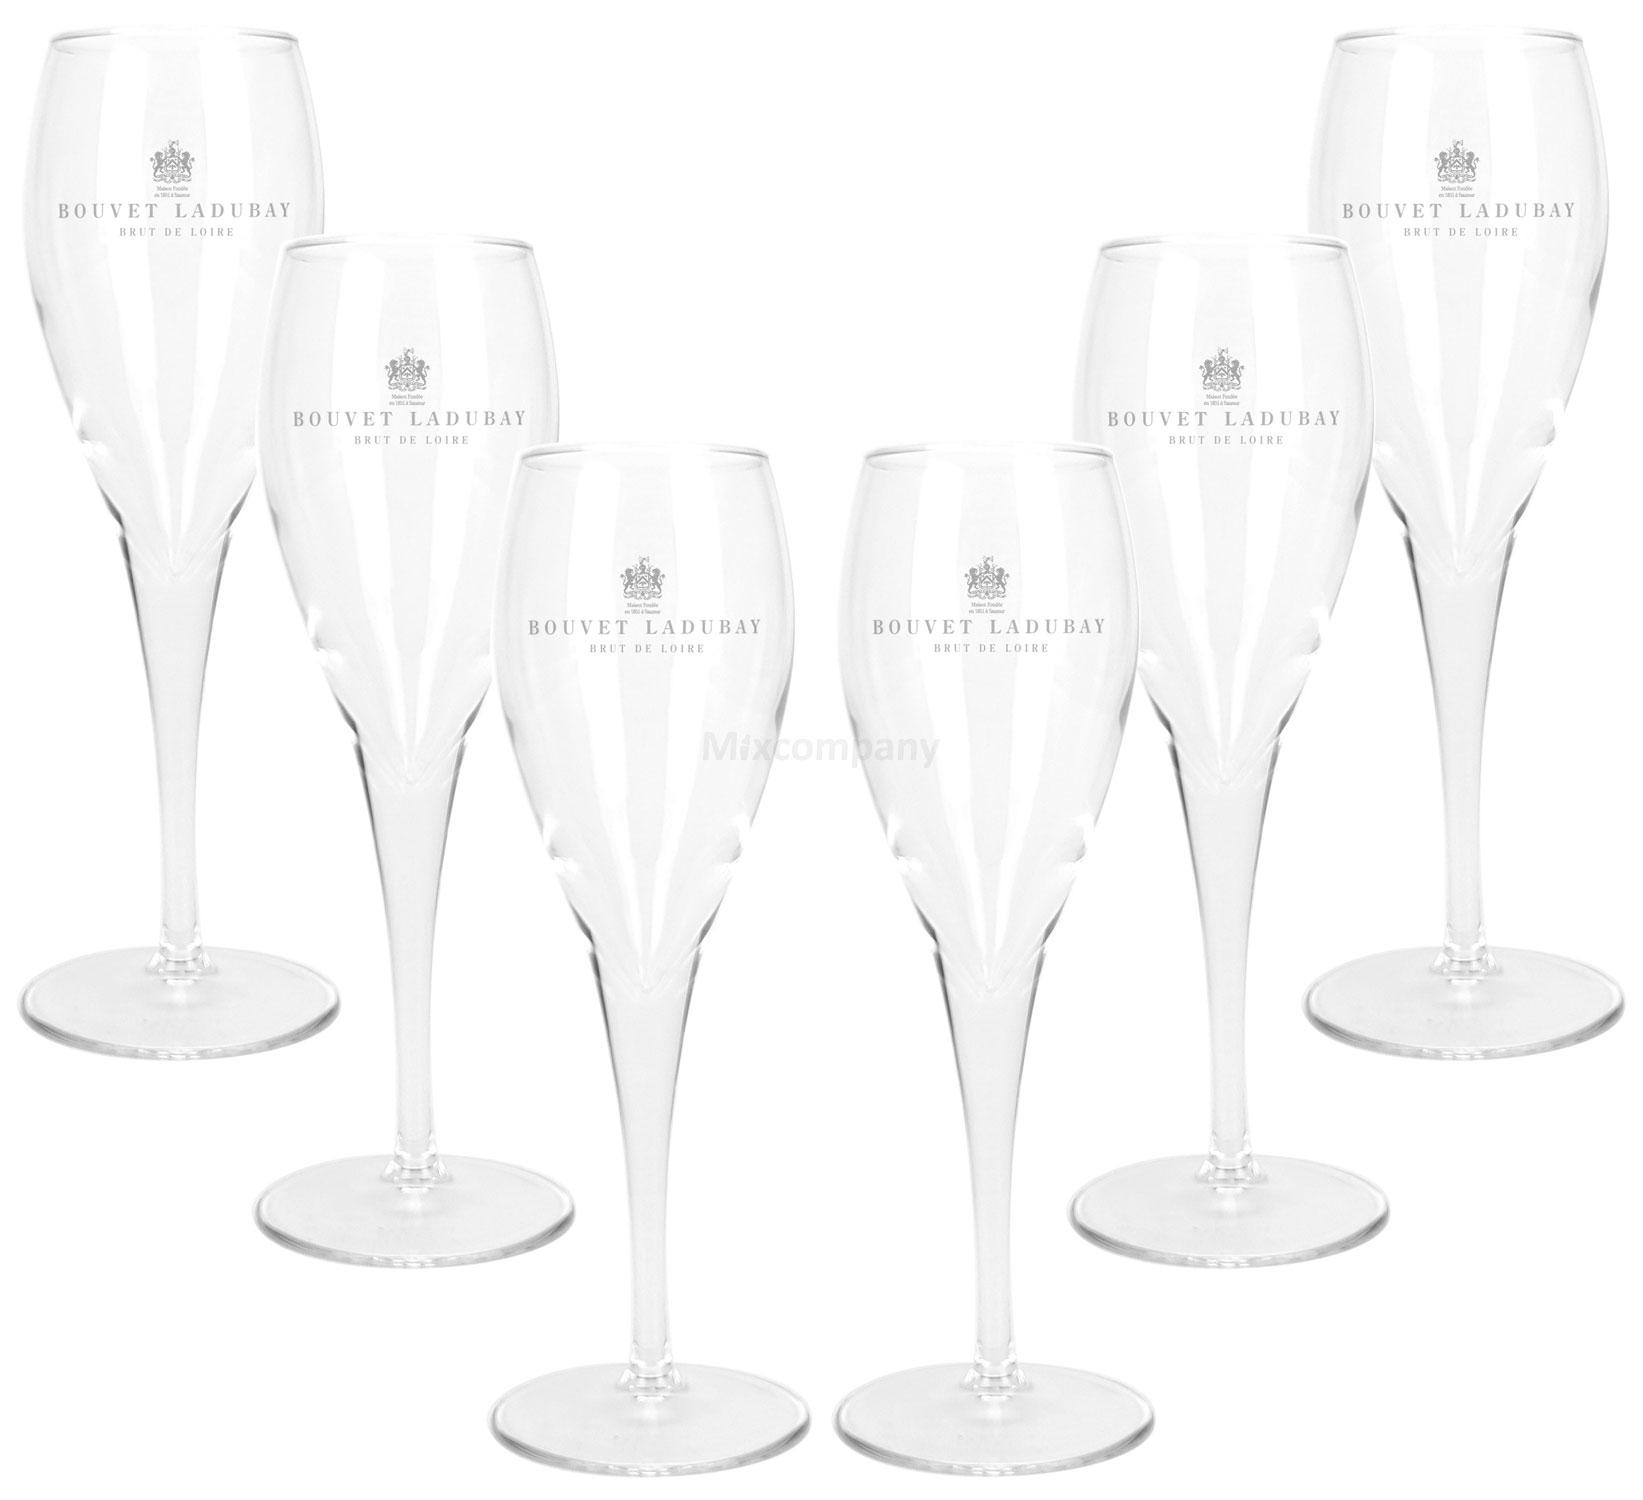 Bouvet Ladubay Champagner Prosecco Glas Gläser Set - 6x Gläser 0,1l geeicht